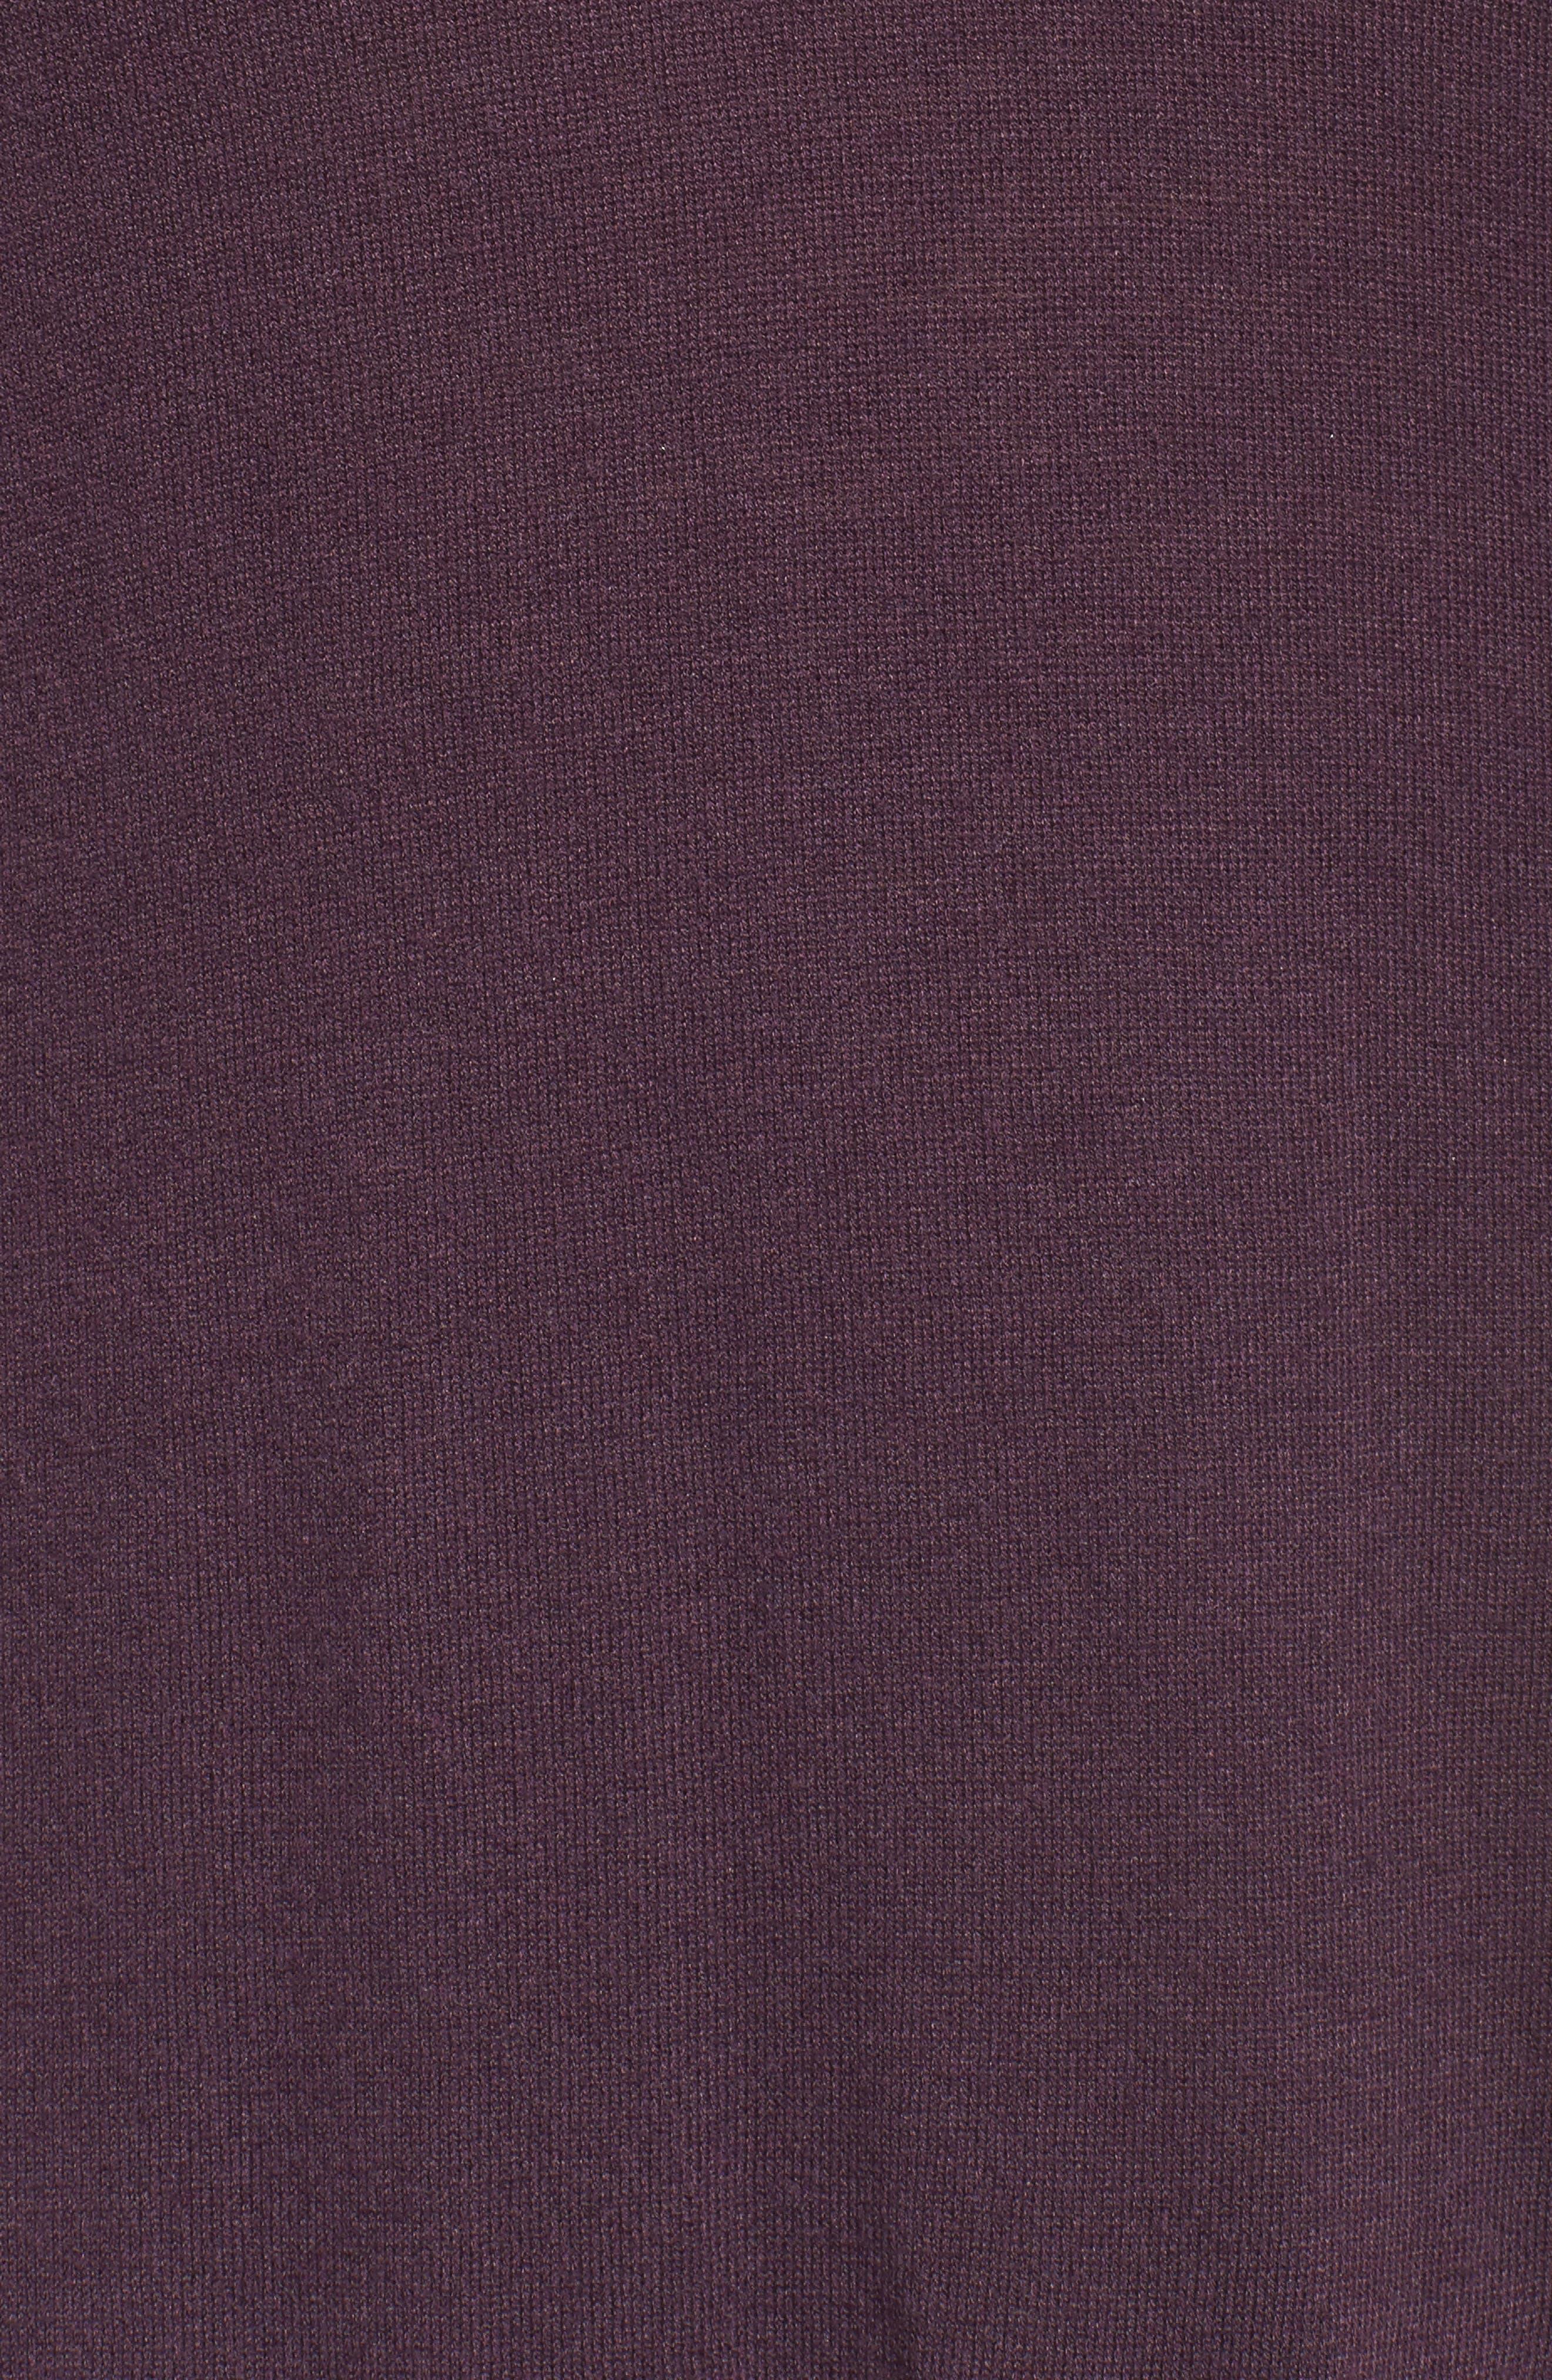 V-Neck Asymmetrical Tunic,                             Alternate thumbnail 5, color,                             Purple Plum